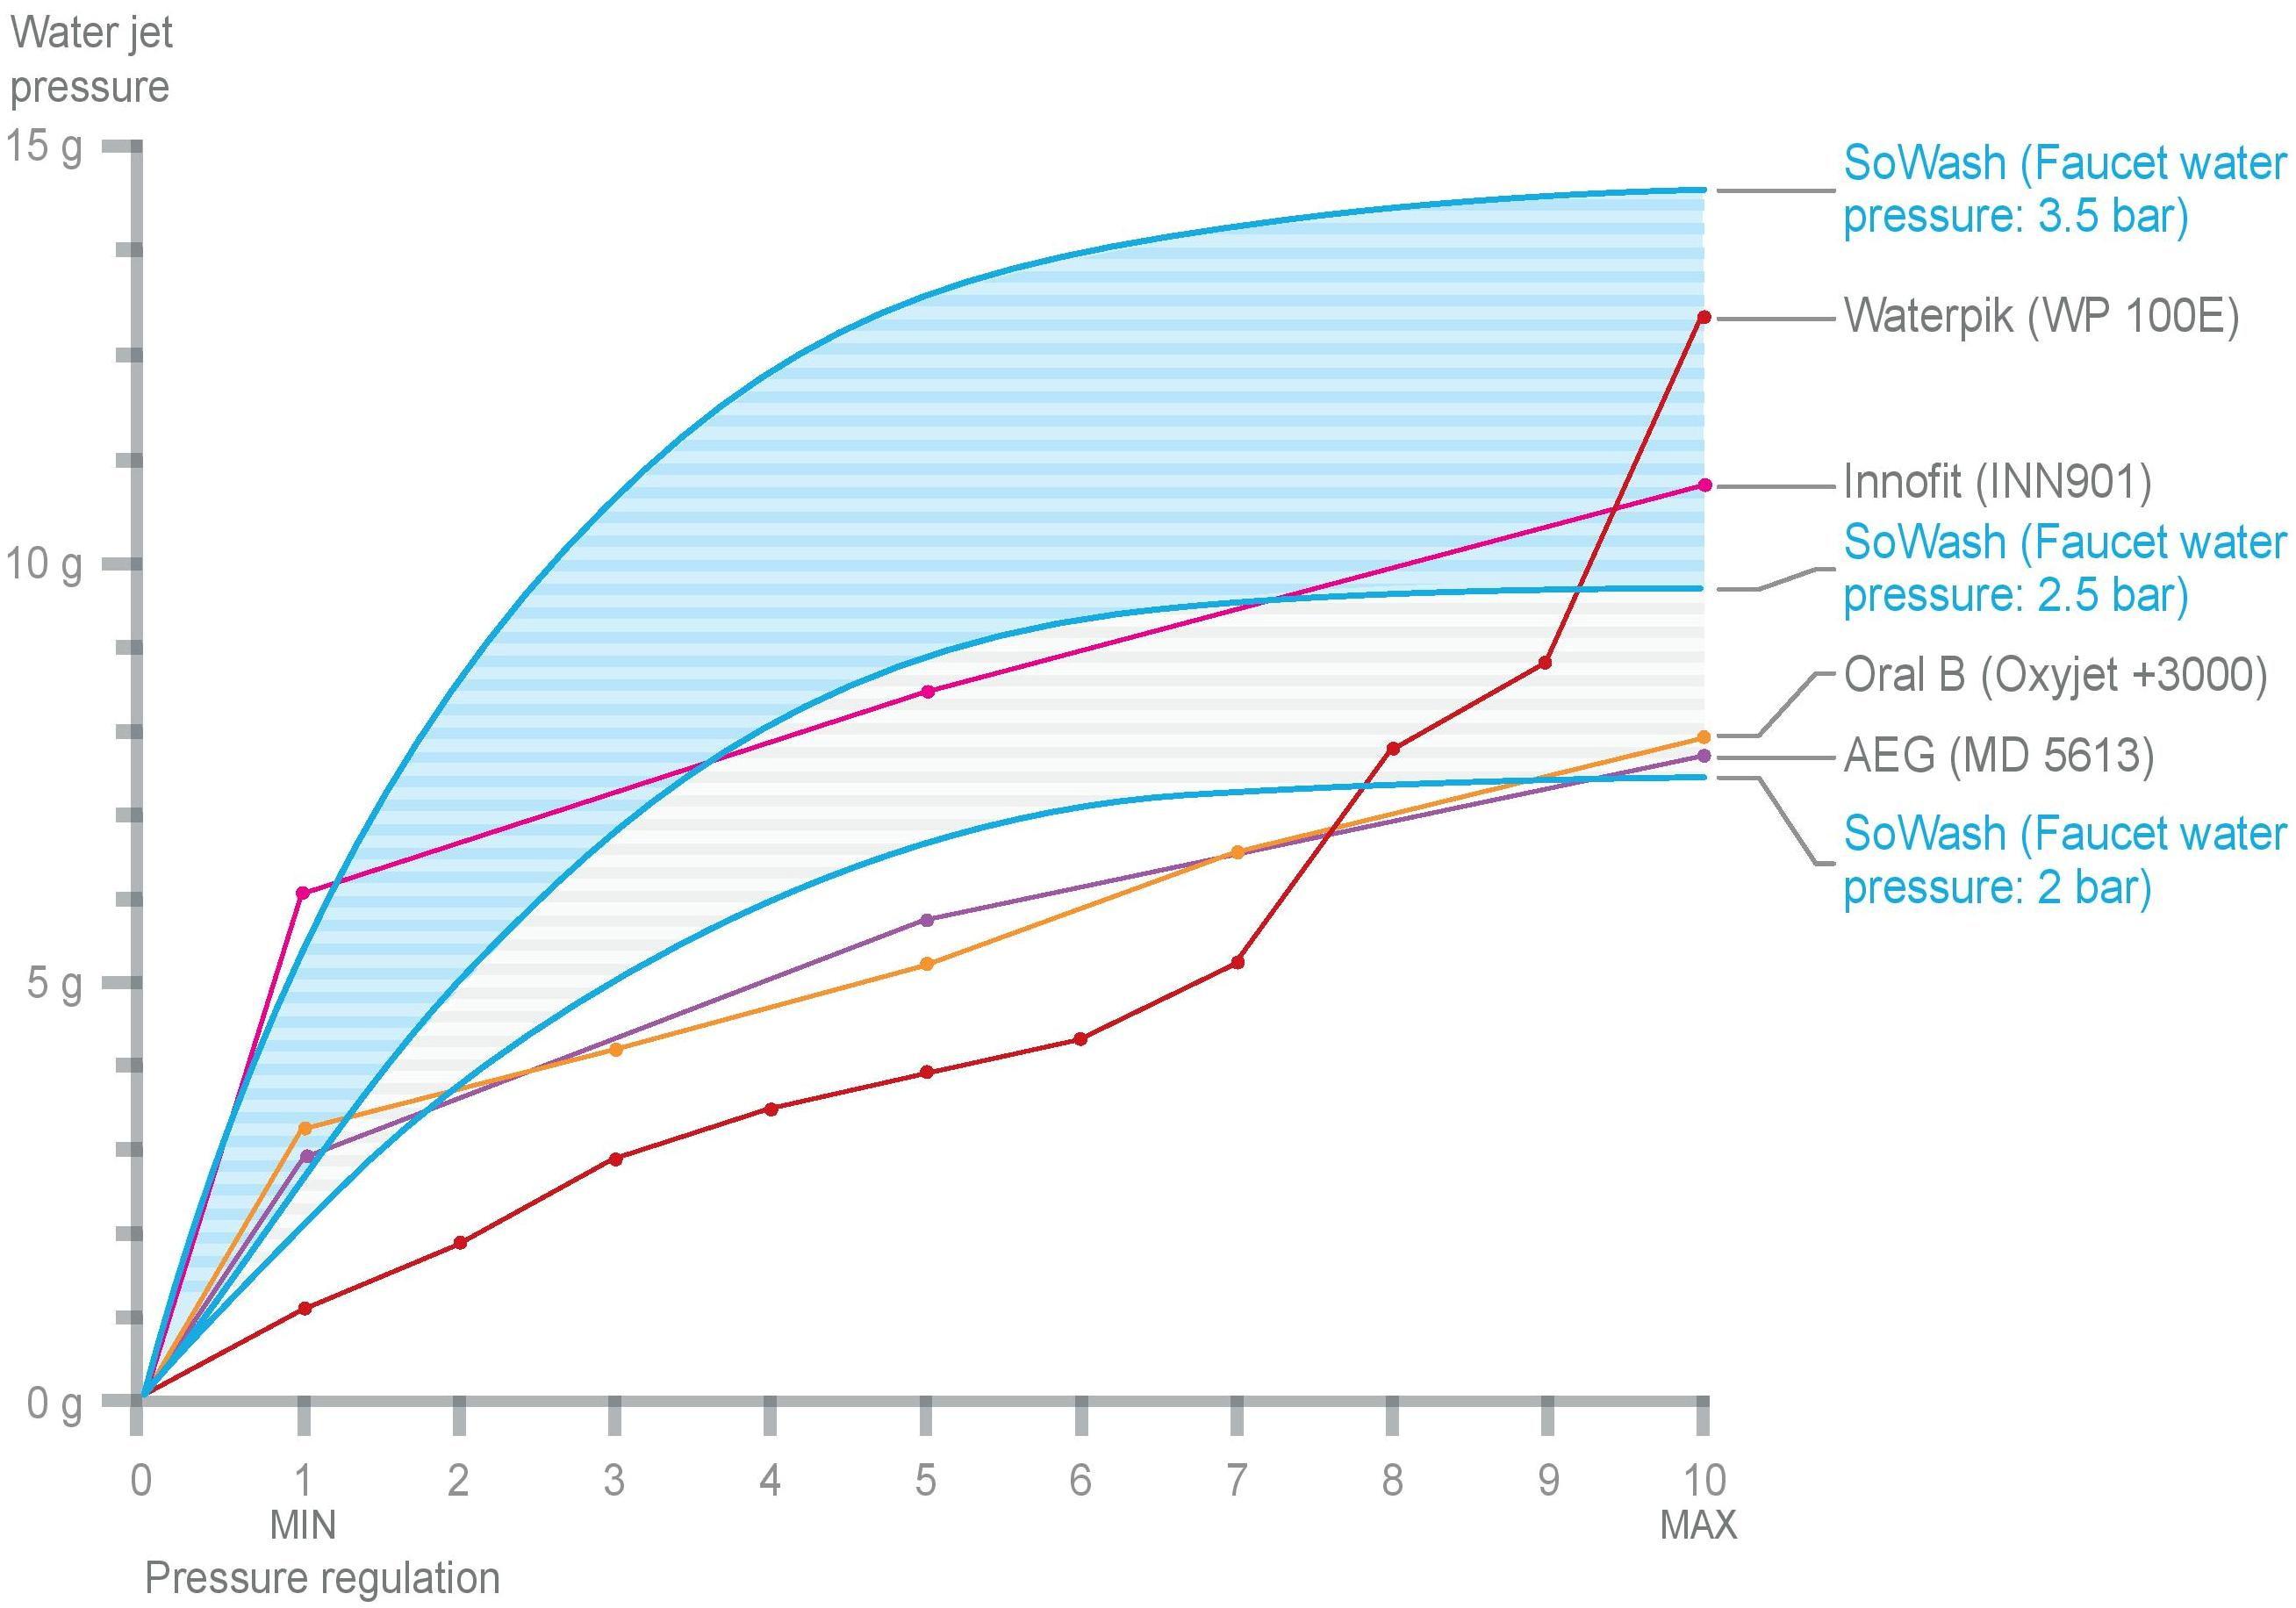 Comparison of water jet pressure of SoWash with electric oral irrigators